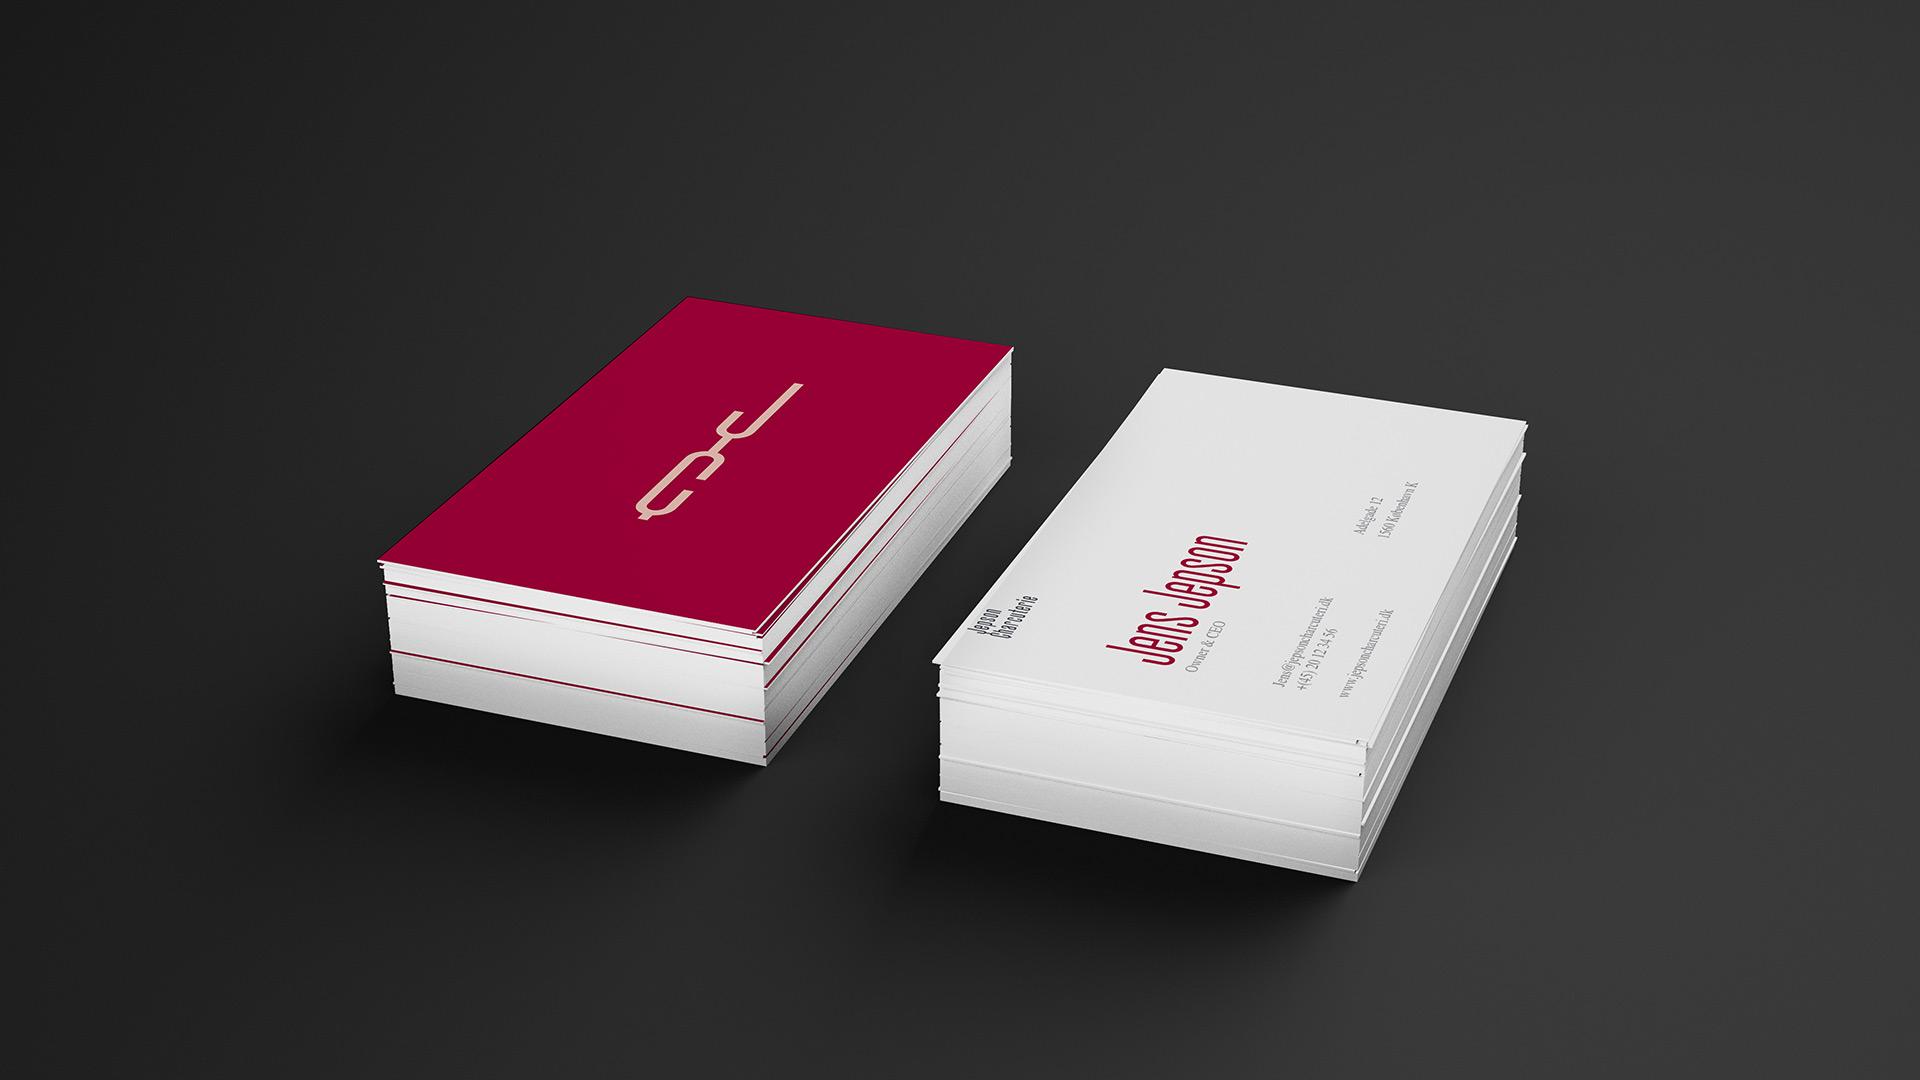 Jepson Charcuteri - Visual Identity - Visitkort